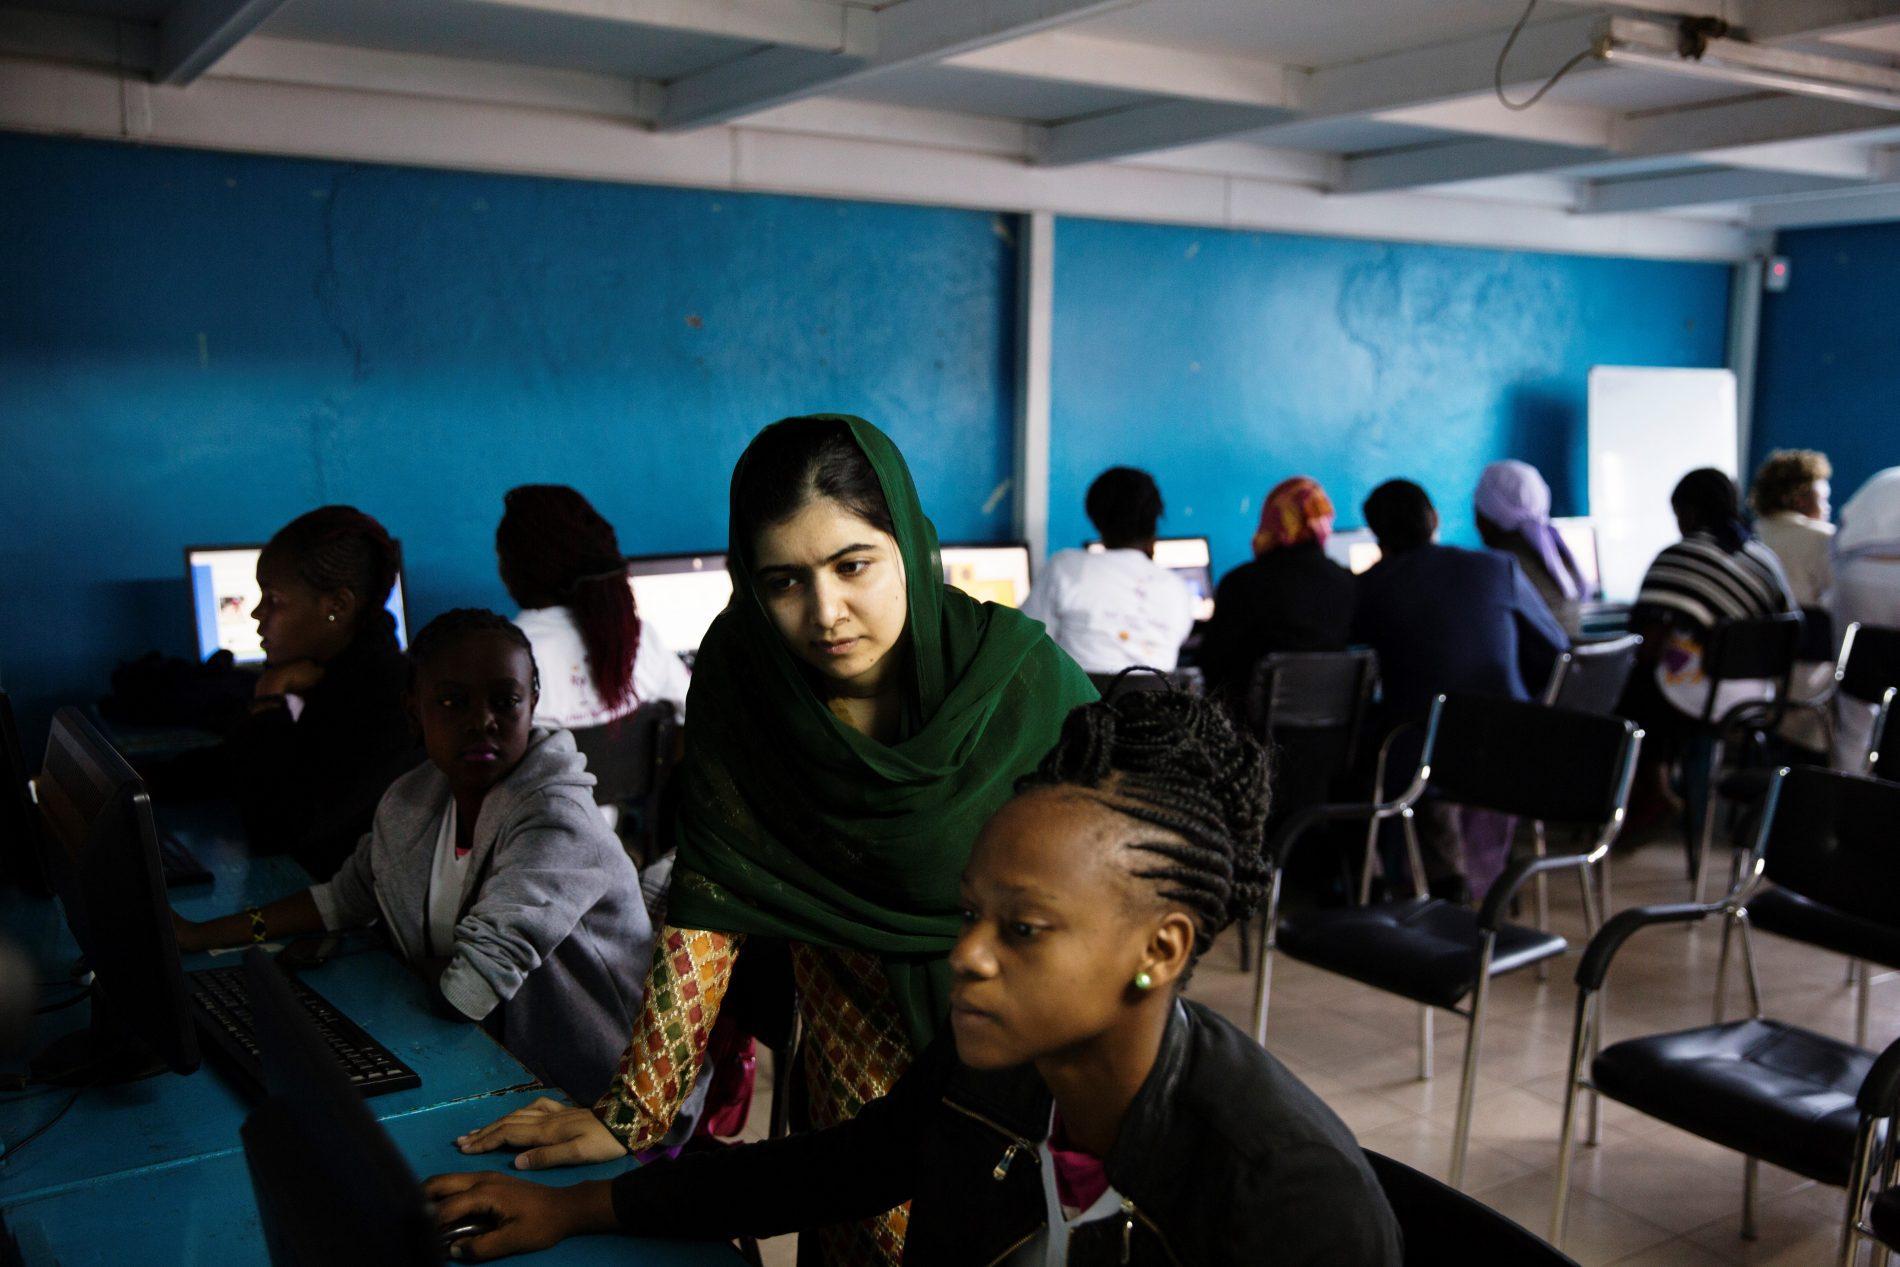 Malala with a student at Nairobits, a tech-training program for young women in Kenya (Credit: Malin Fezehai / Malala Fund)